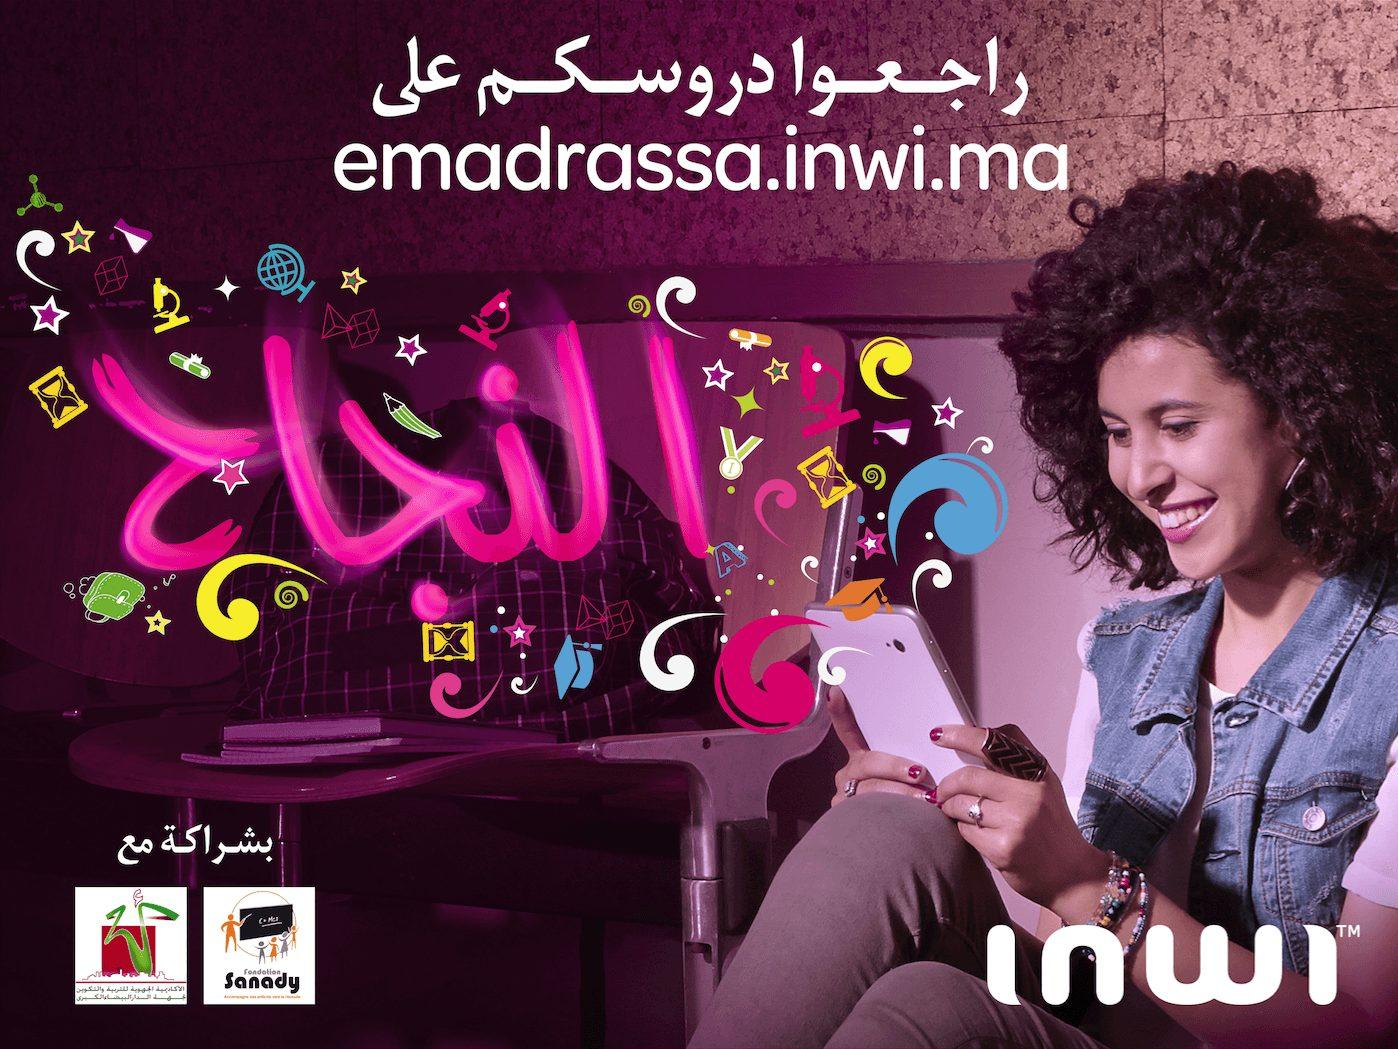 Emadrassa : Inwi accompagne les élèves